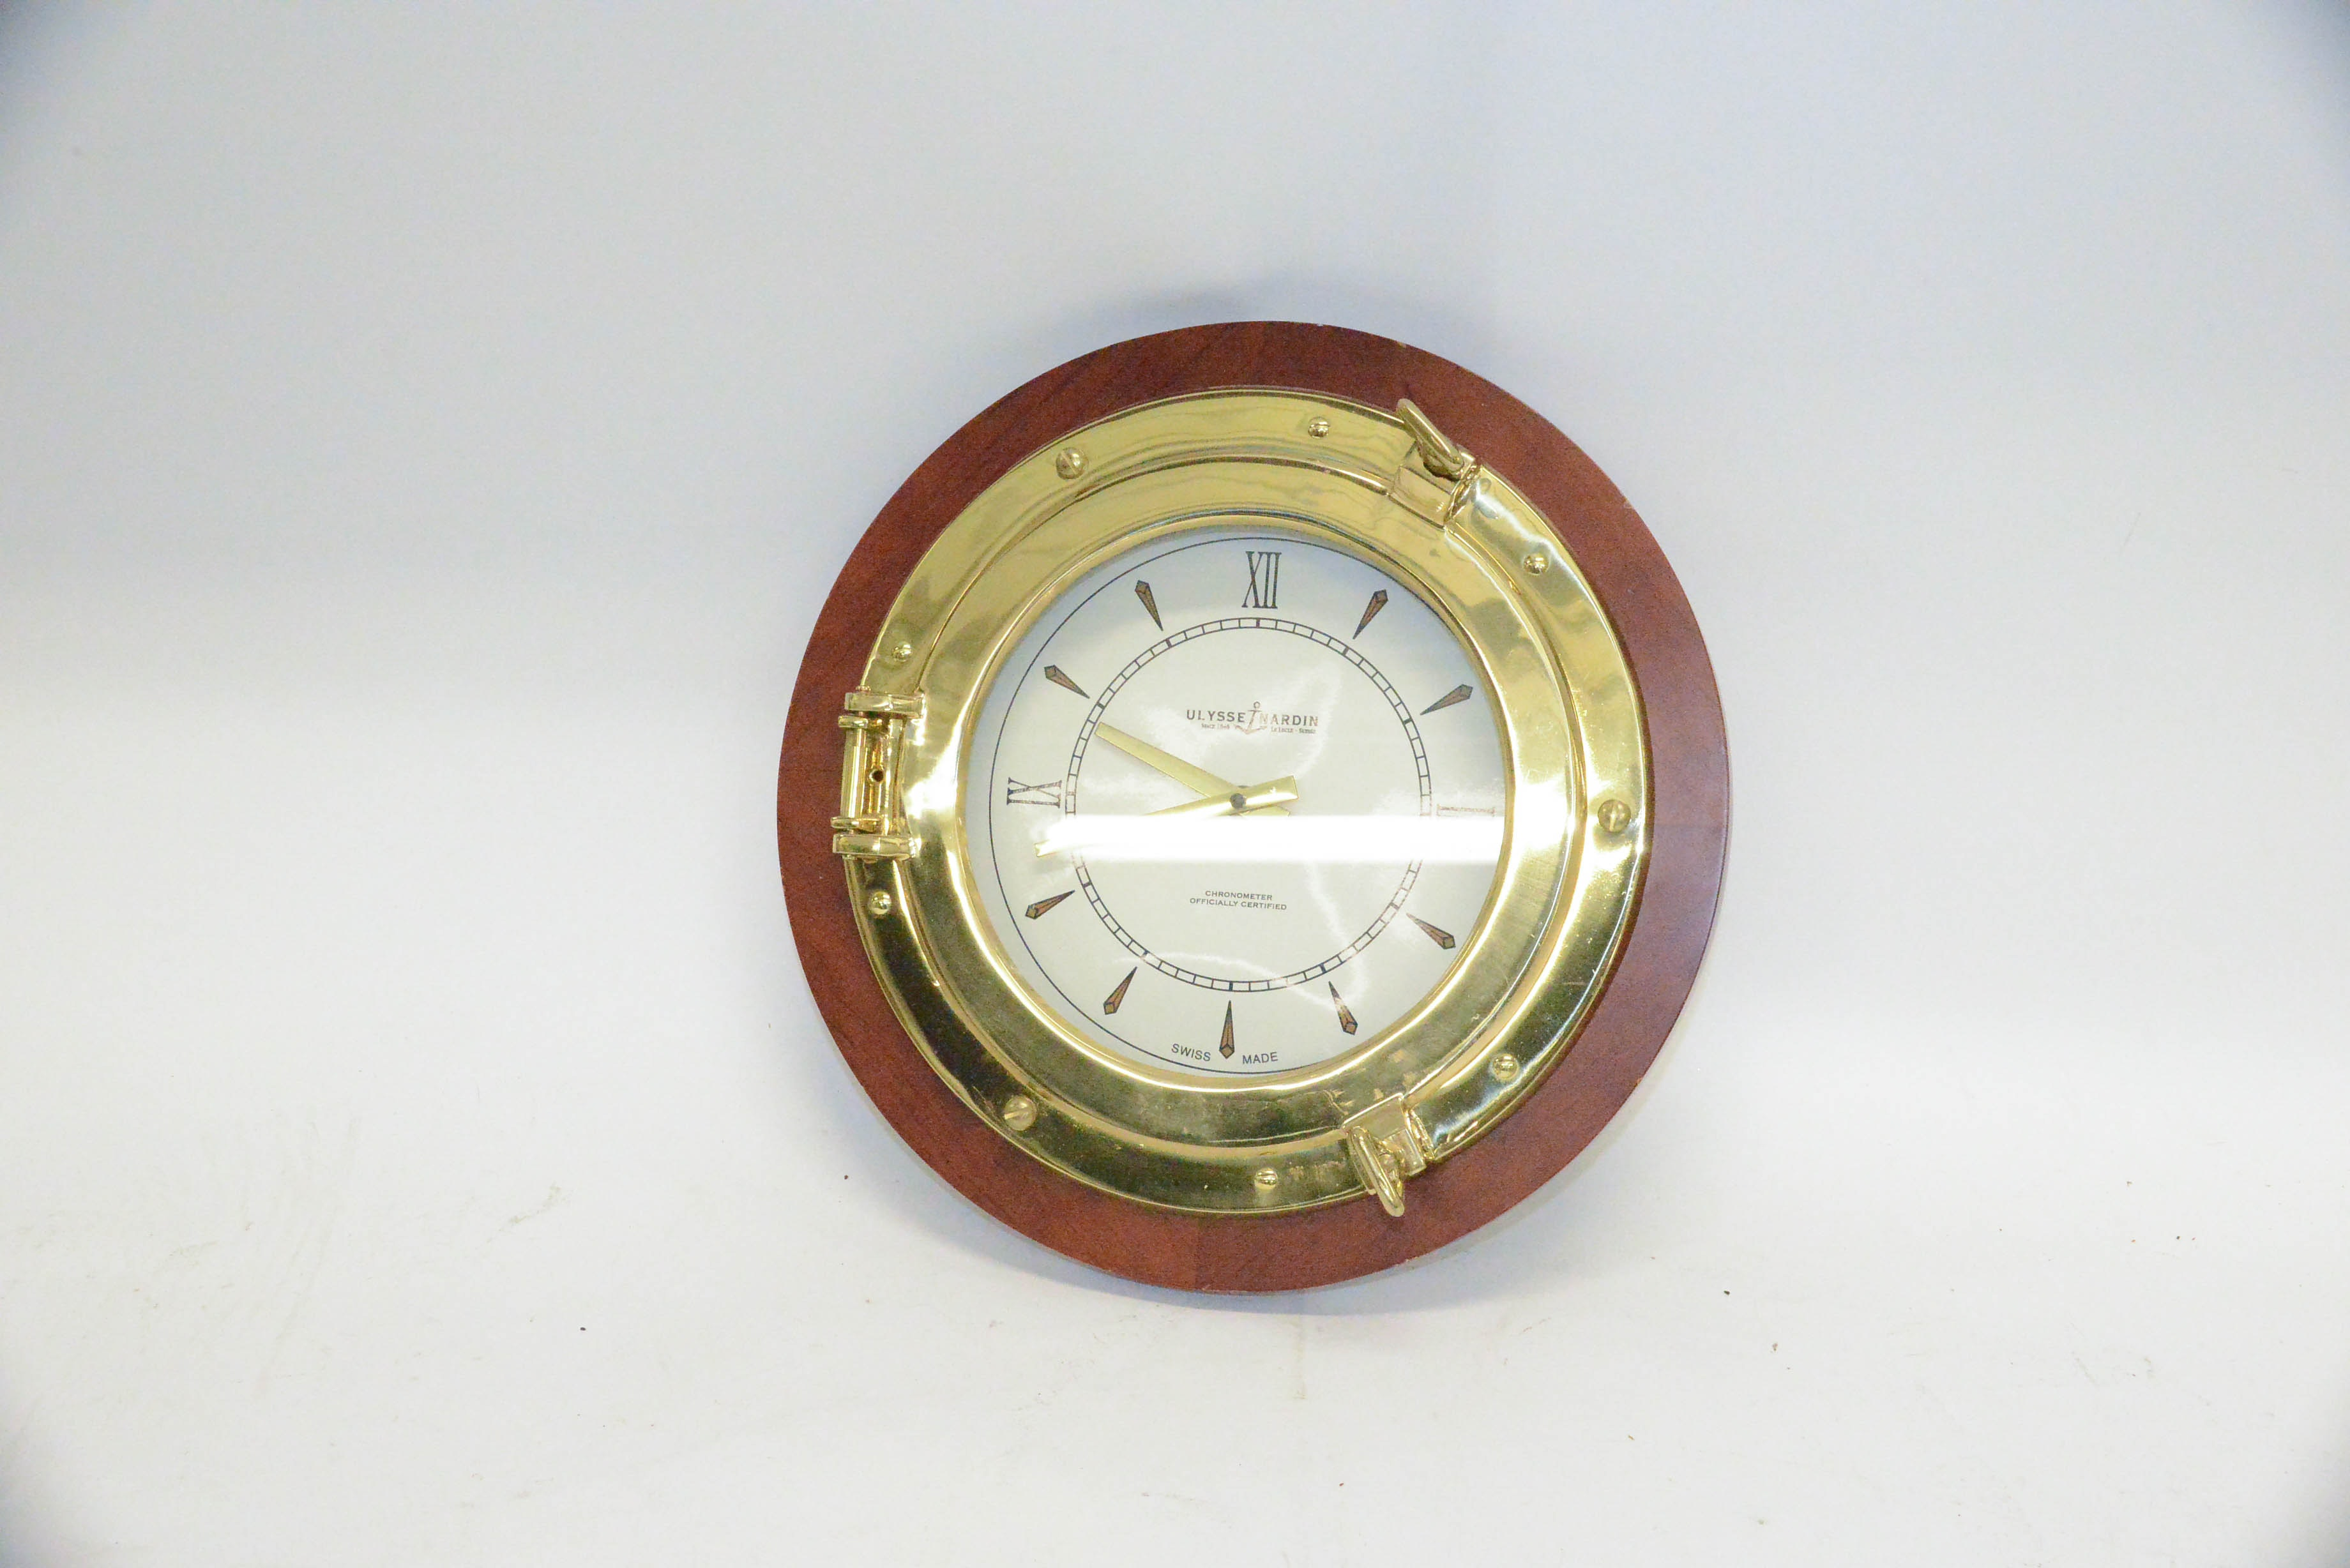 Ulysse Nardin Ship Clock